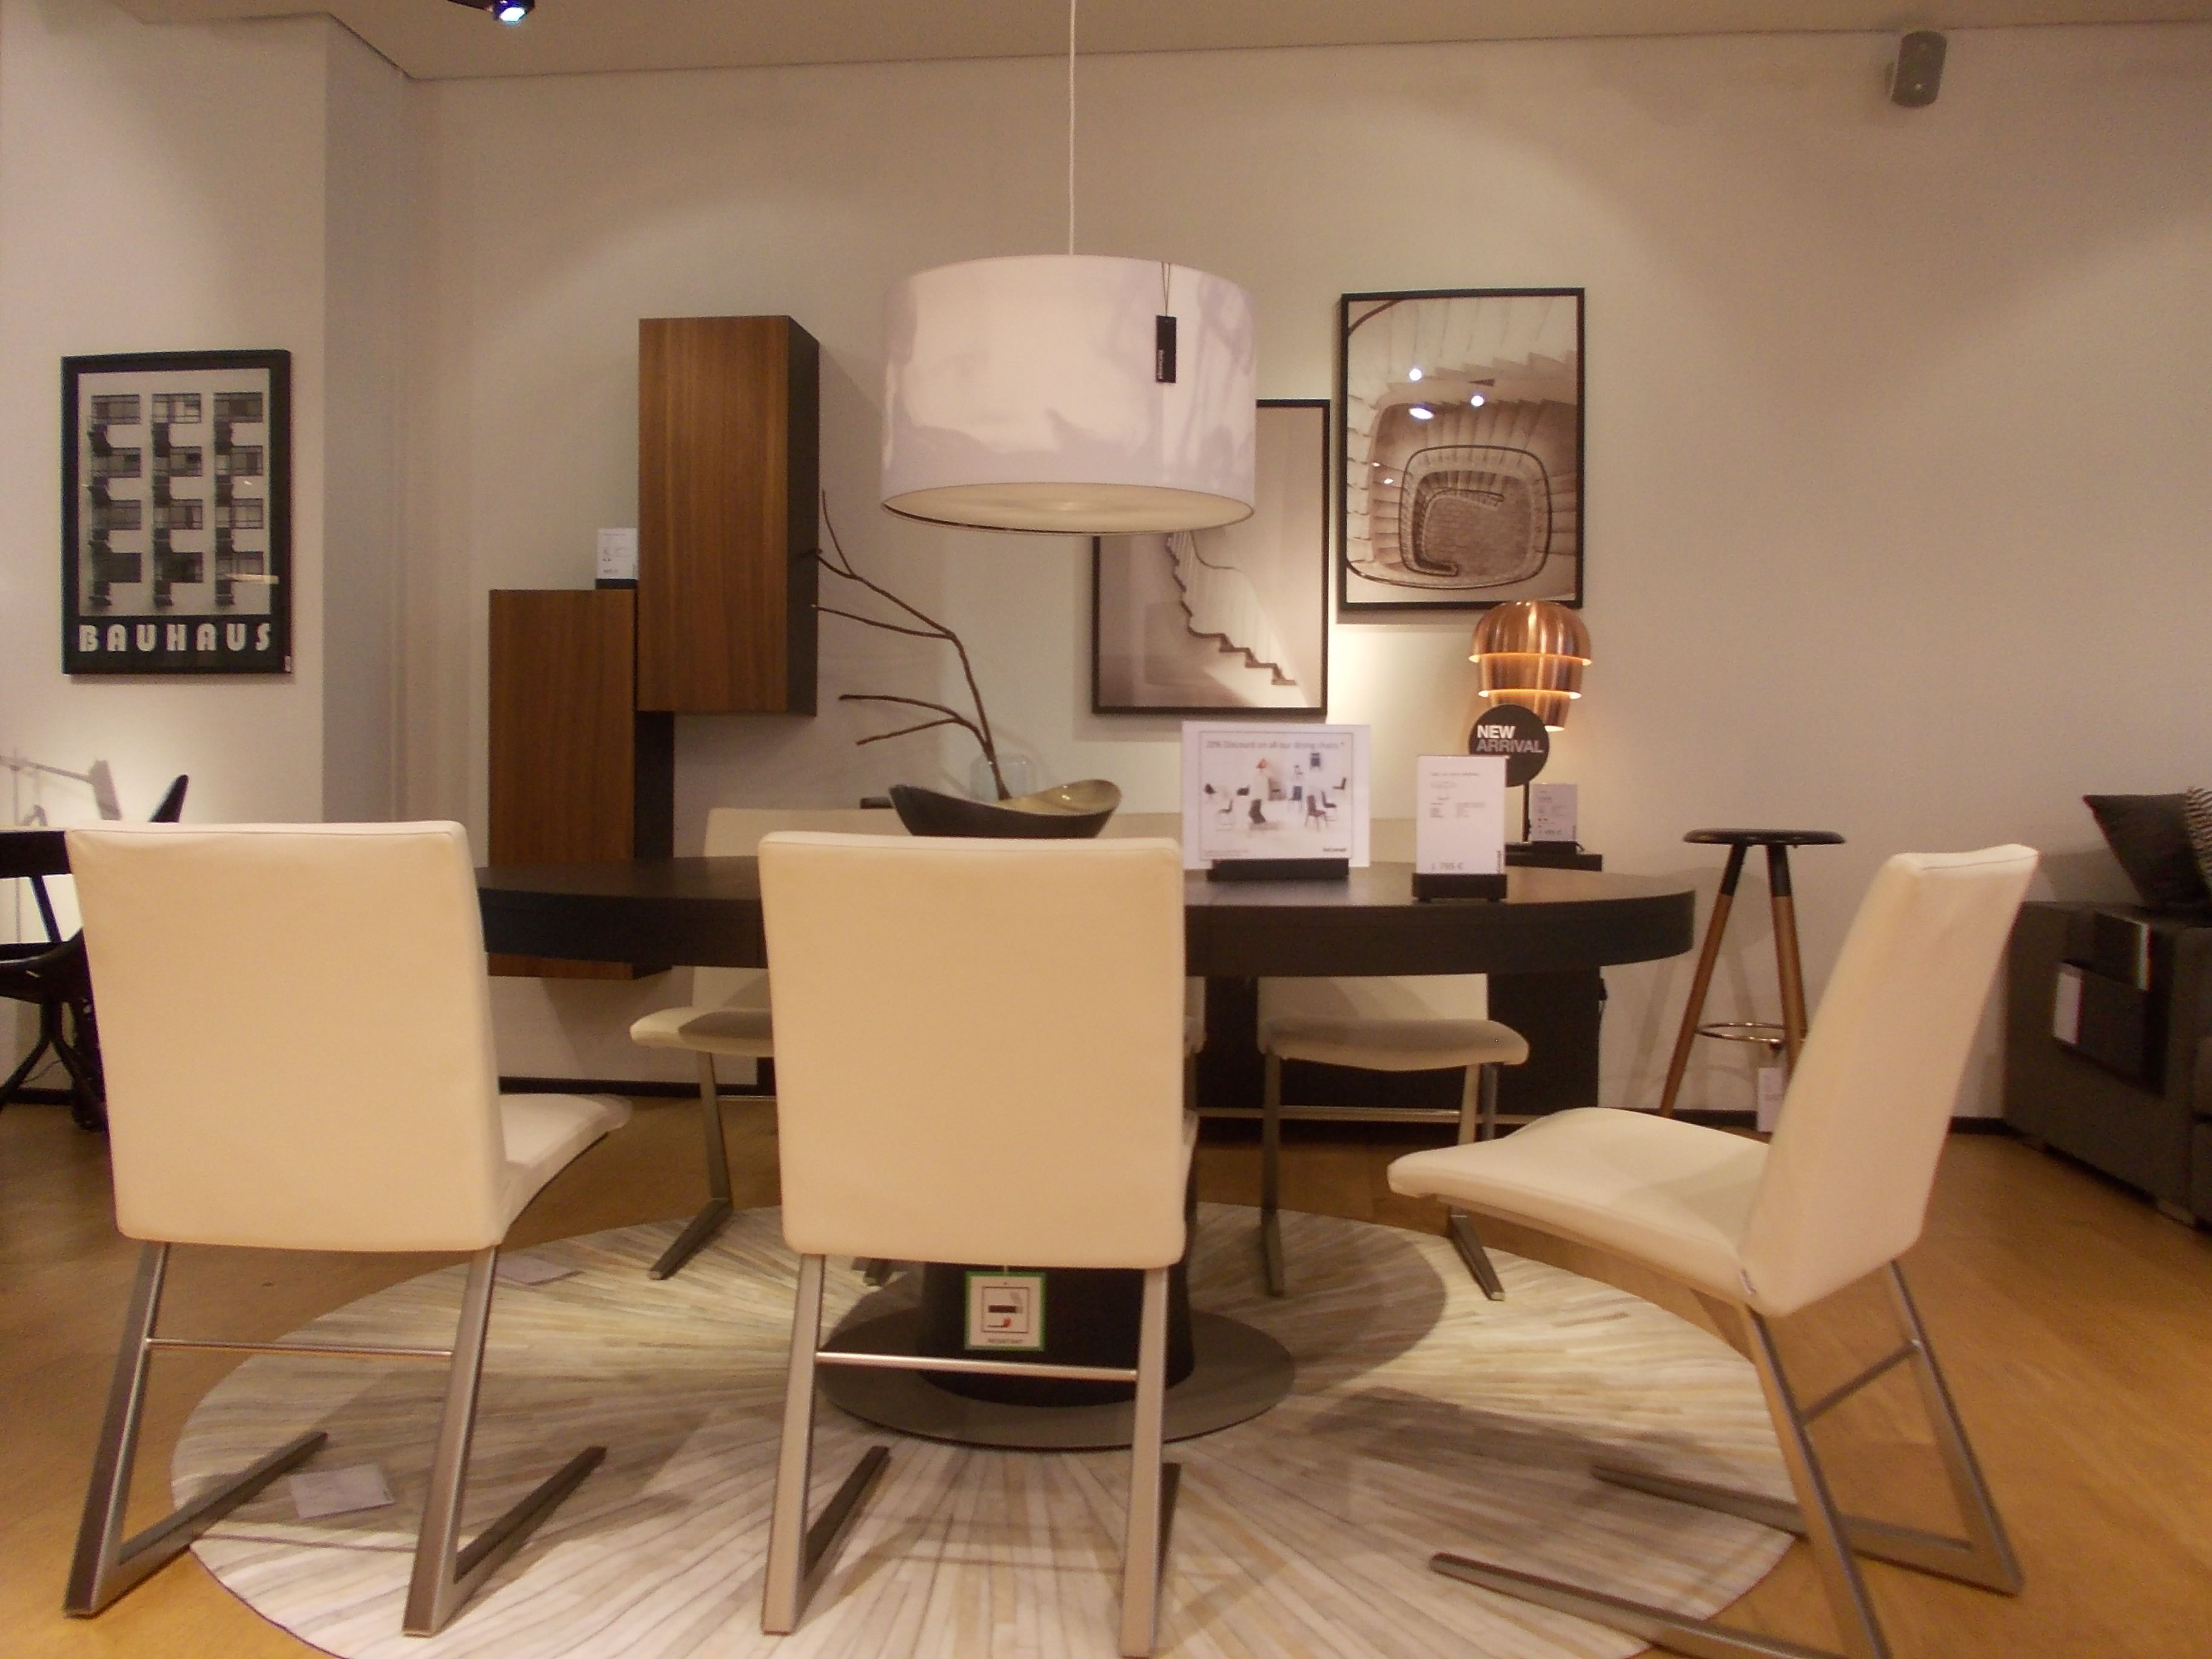 boconcept antwerp boconcept belgium showrooms pinterest boconcept and showroom. Black Bedroom Furniture Sets. Home Design Ideas